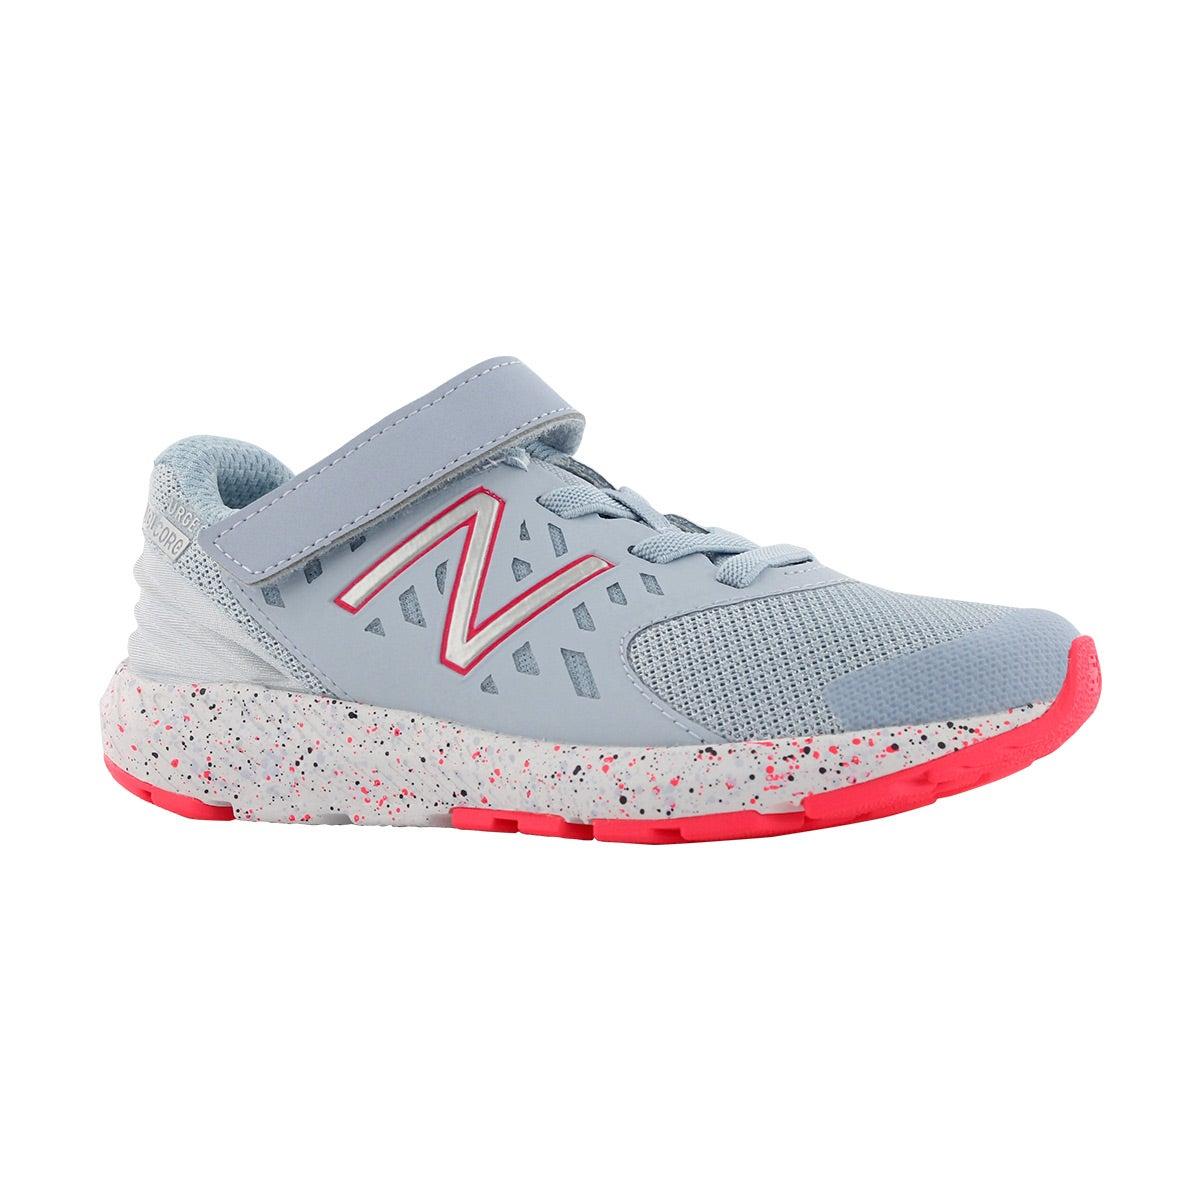 Grls Urge blue/pink bungee lace sneaker